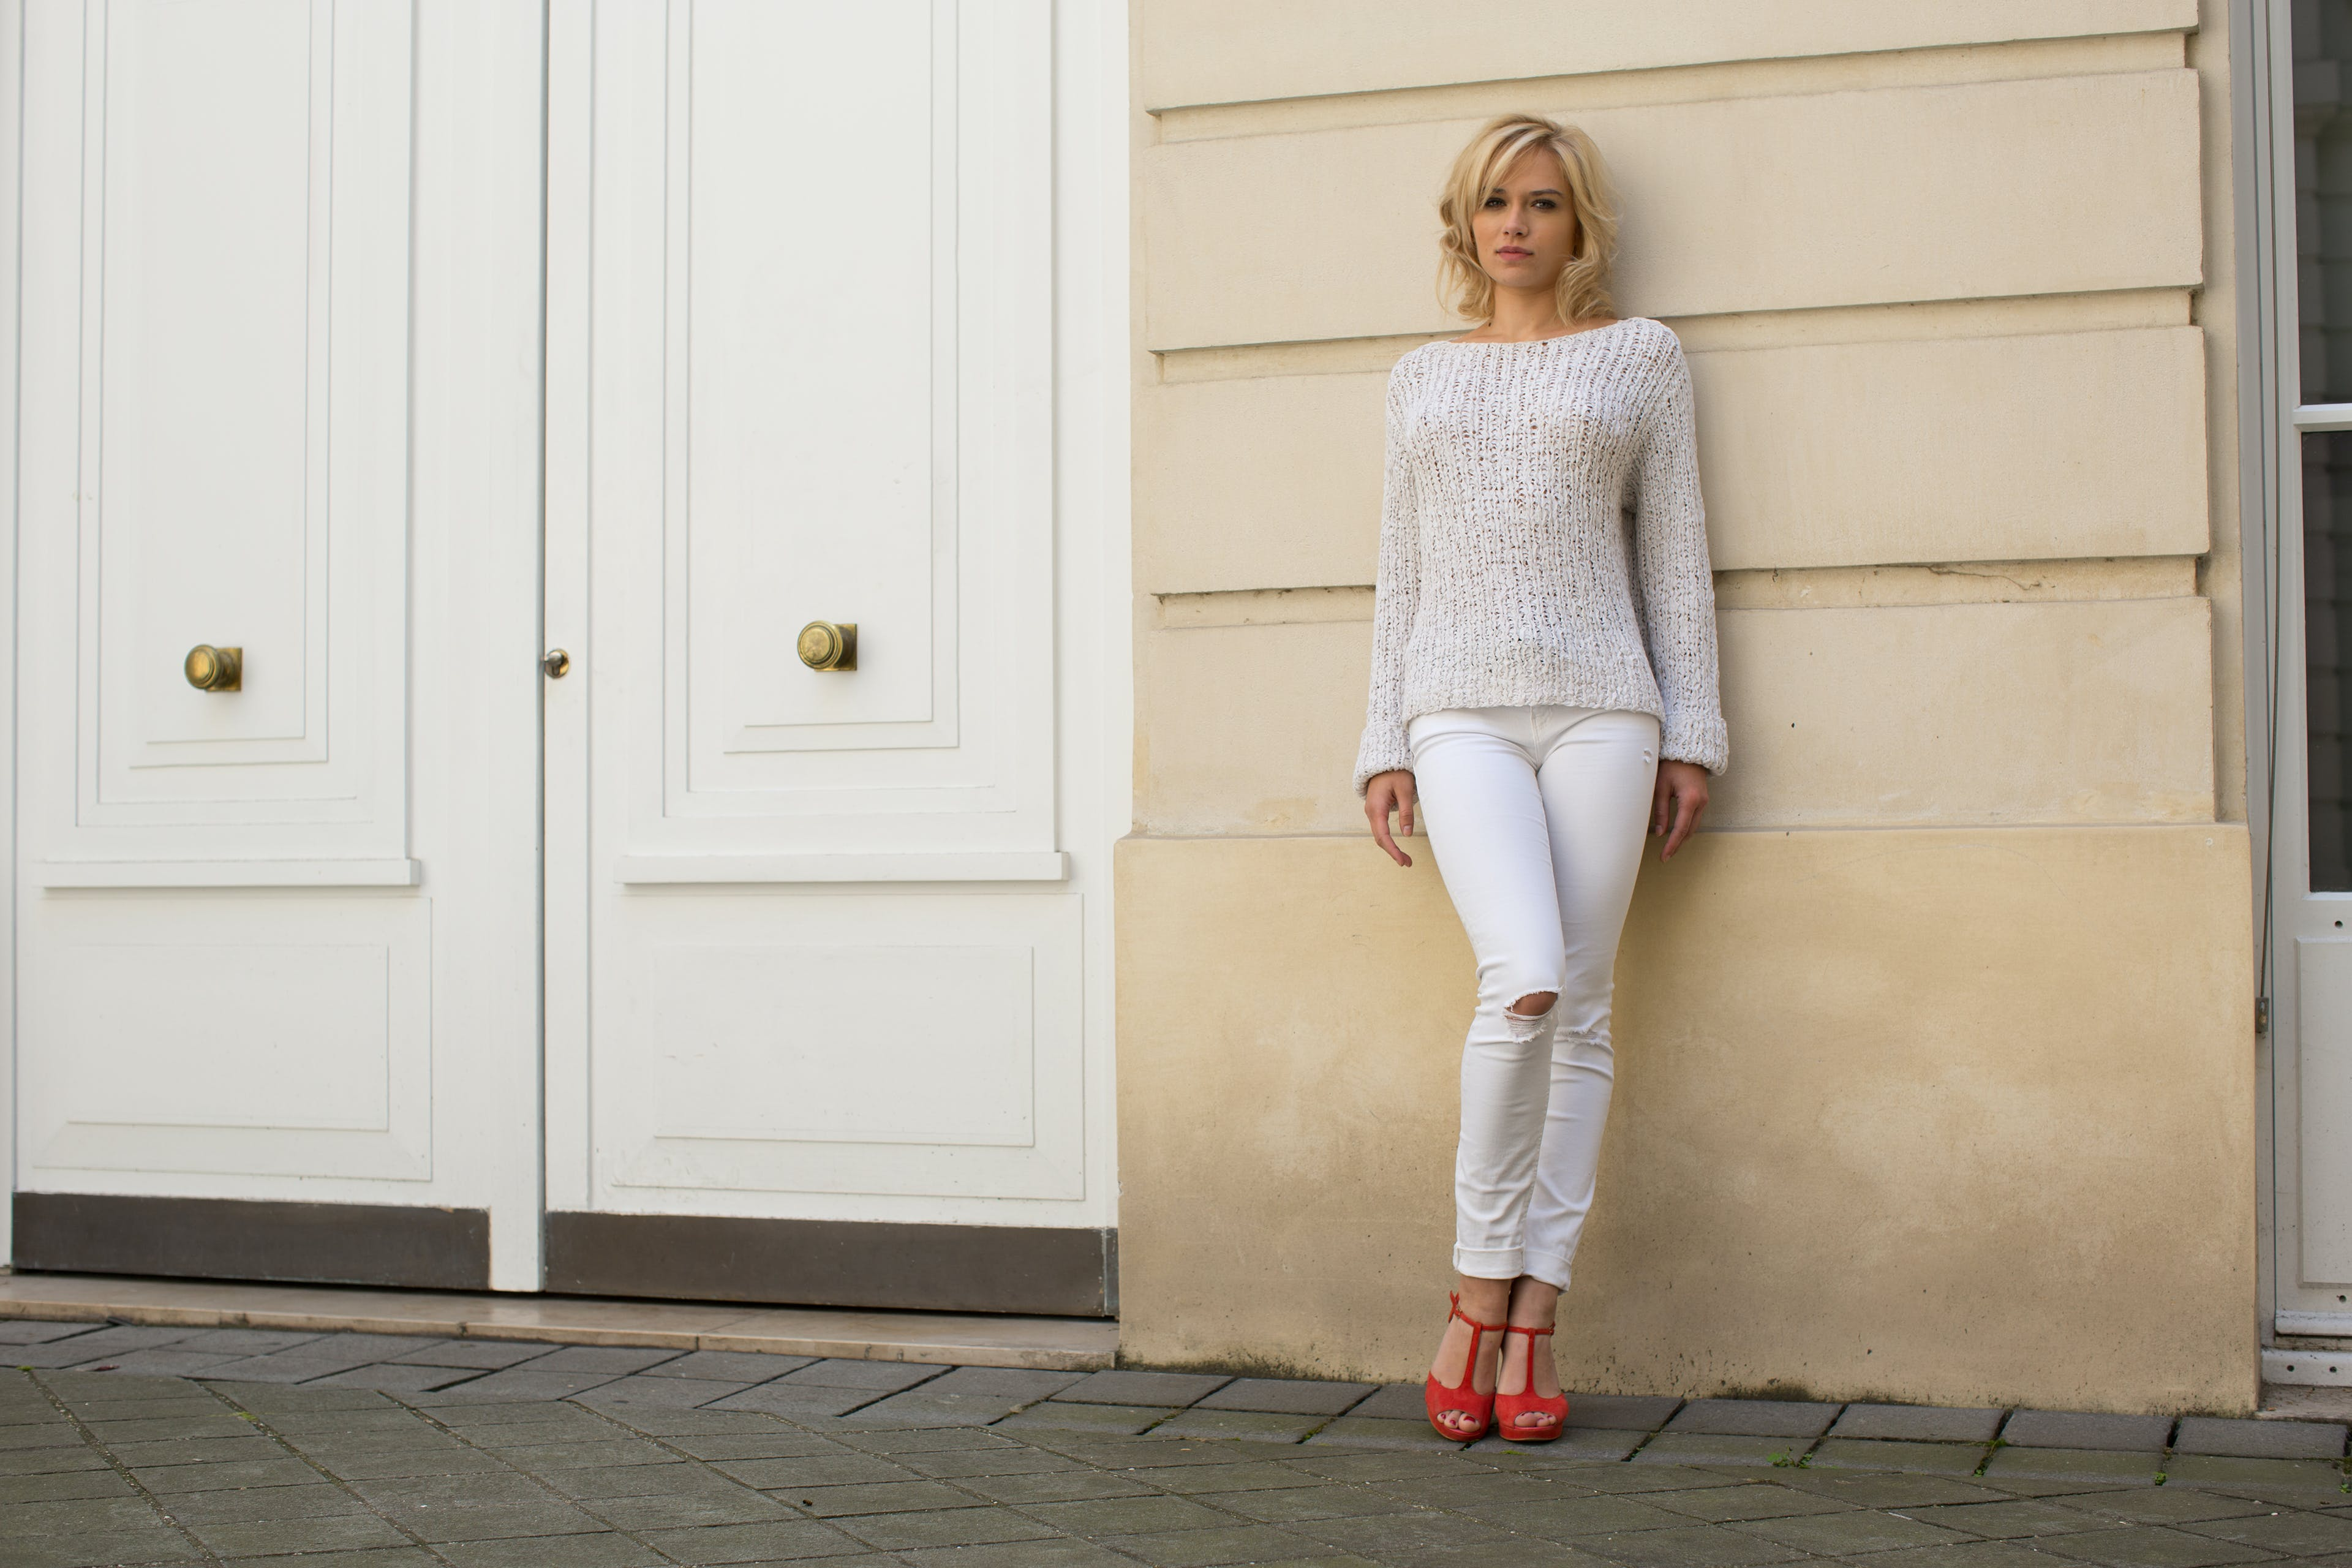 Woman in  casual wear Leaning on Wall